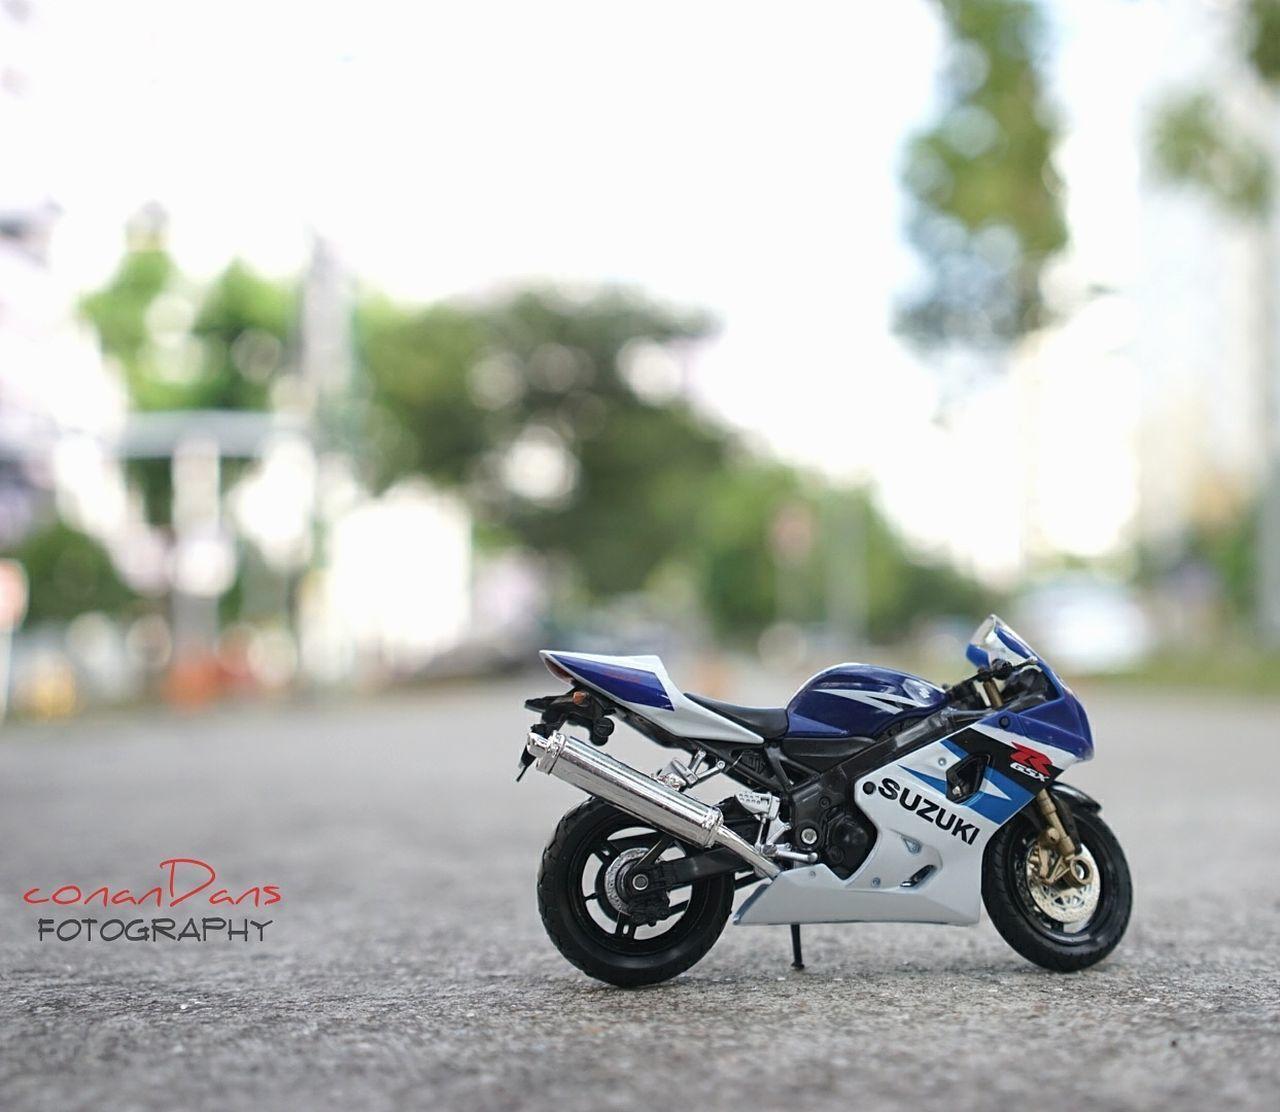 Motorbike Motorsport Motorcycle Outdoors Sports Race Toyphotogallery Toyphotography Toy Photography Suzuki Motorcycles Suzuki Toy Photo Toy Photo Challenge Biker The Week On EyeEm